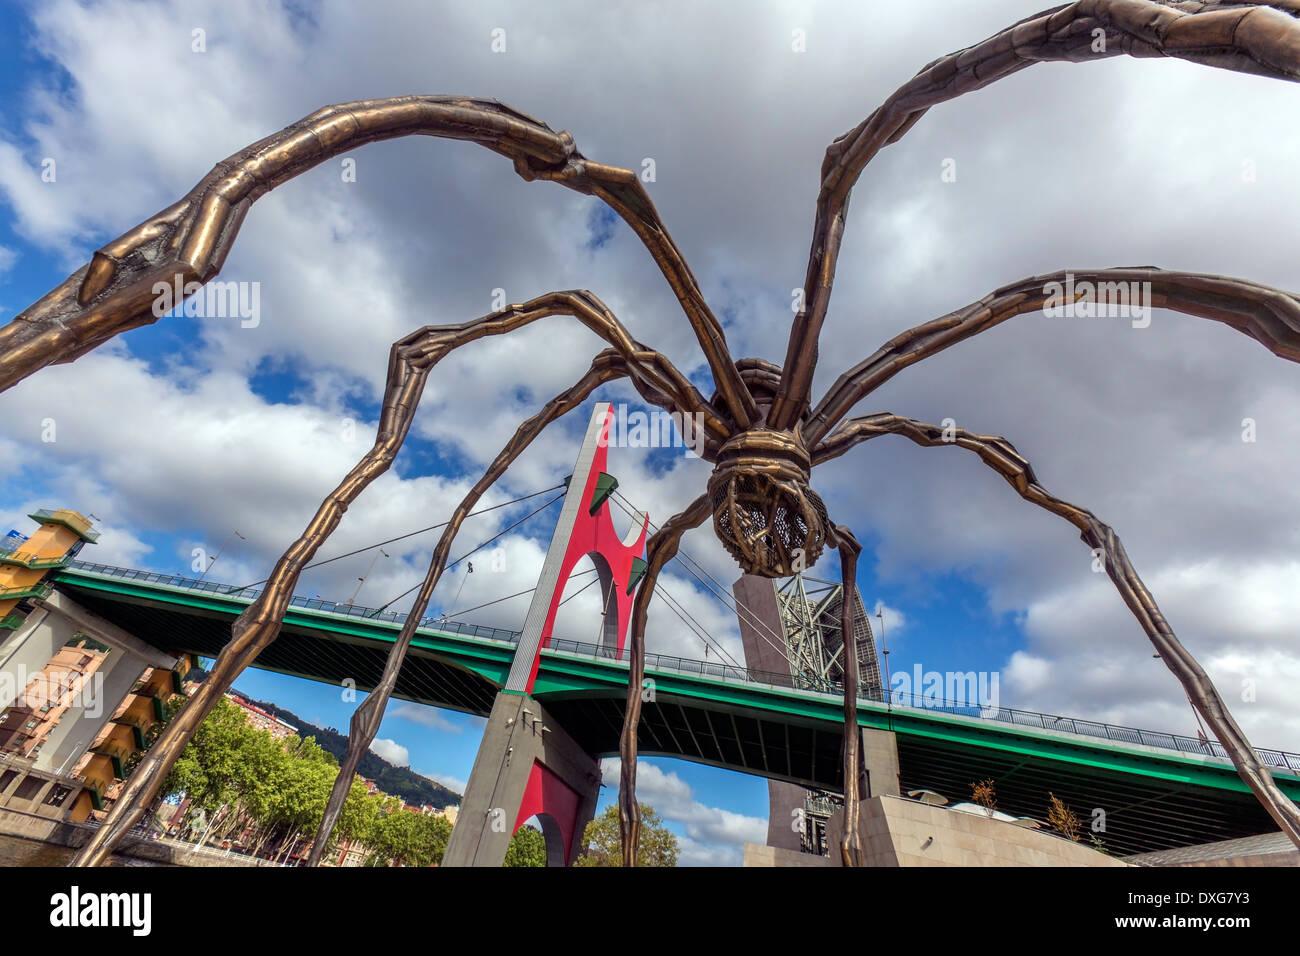 View of the Spider and the Puente de la Salve (Bridge) near the Guggenheim Museum, Bilbao, Spain. - Stock Image